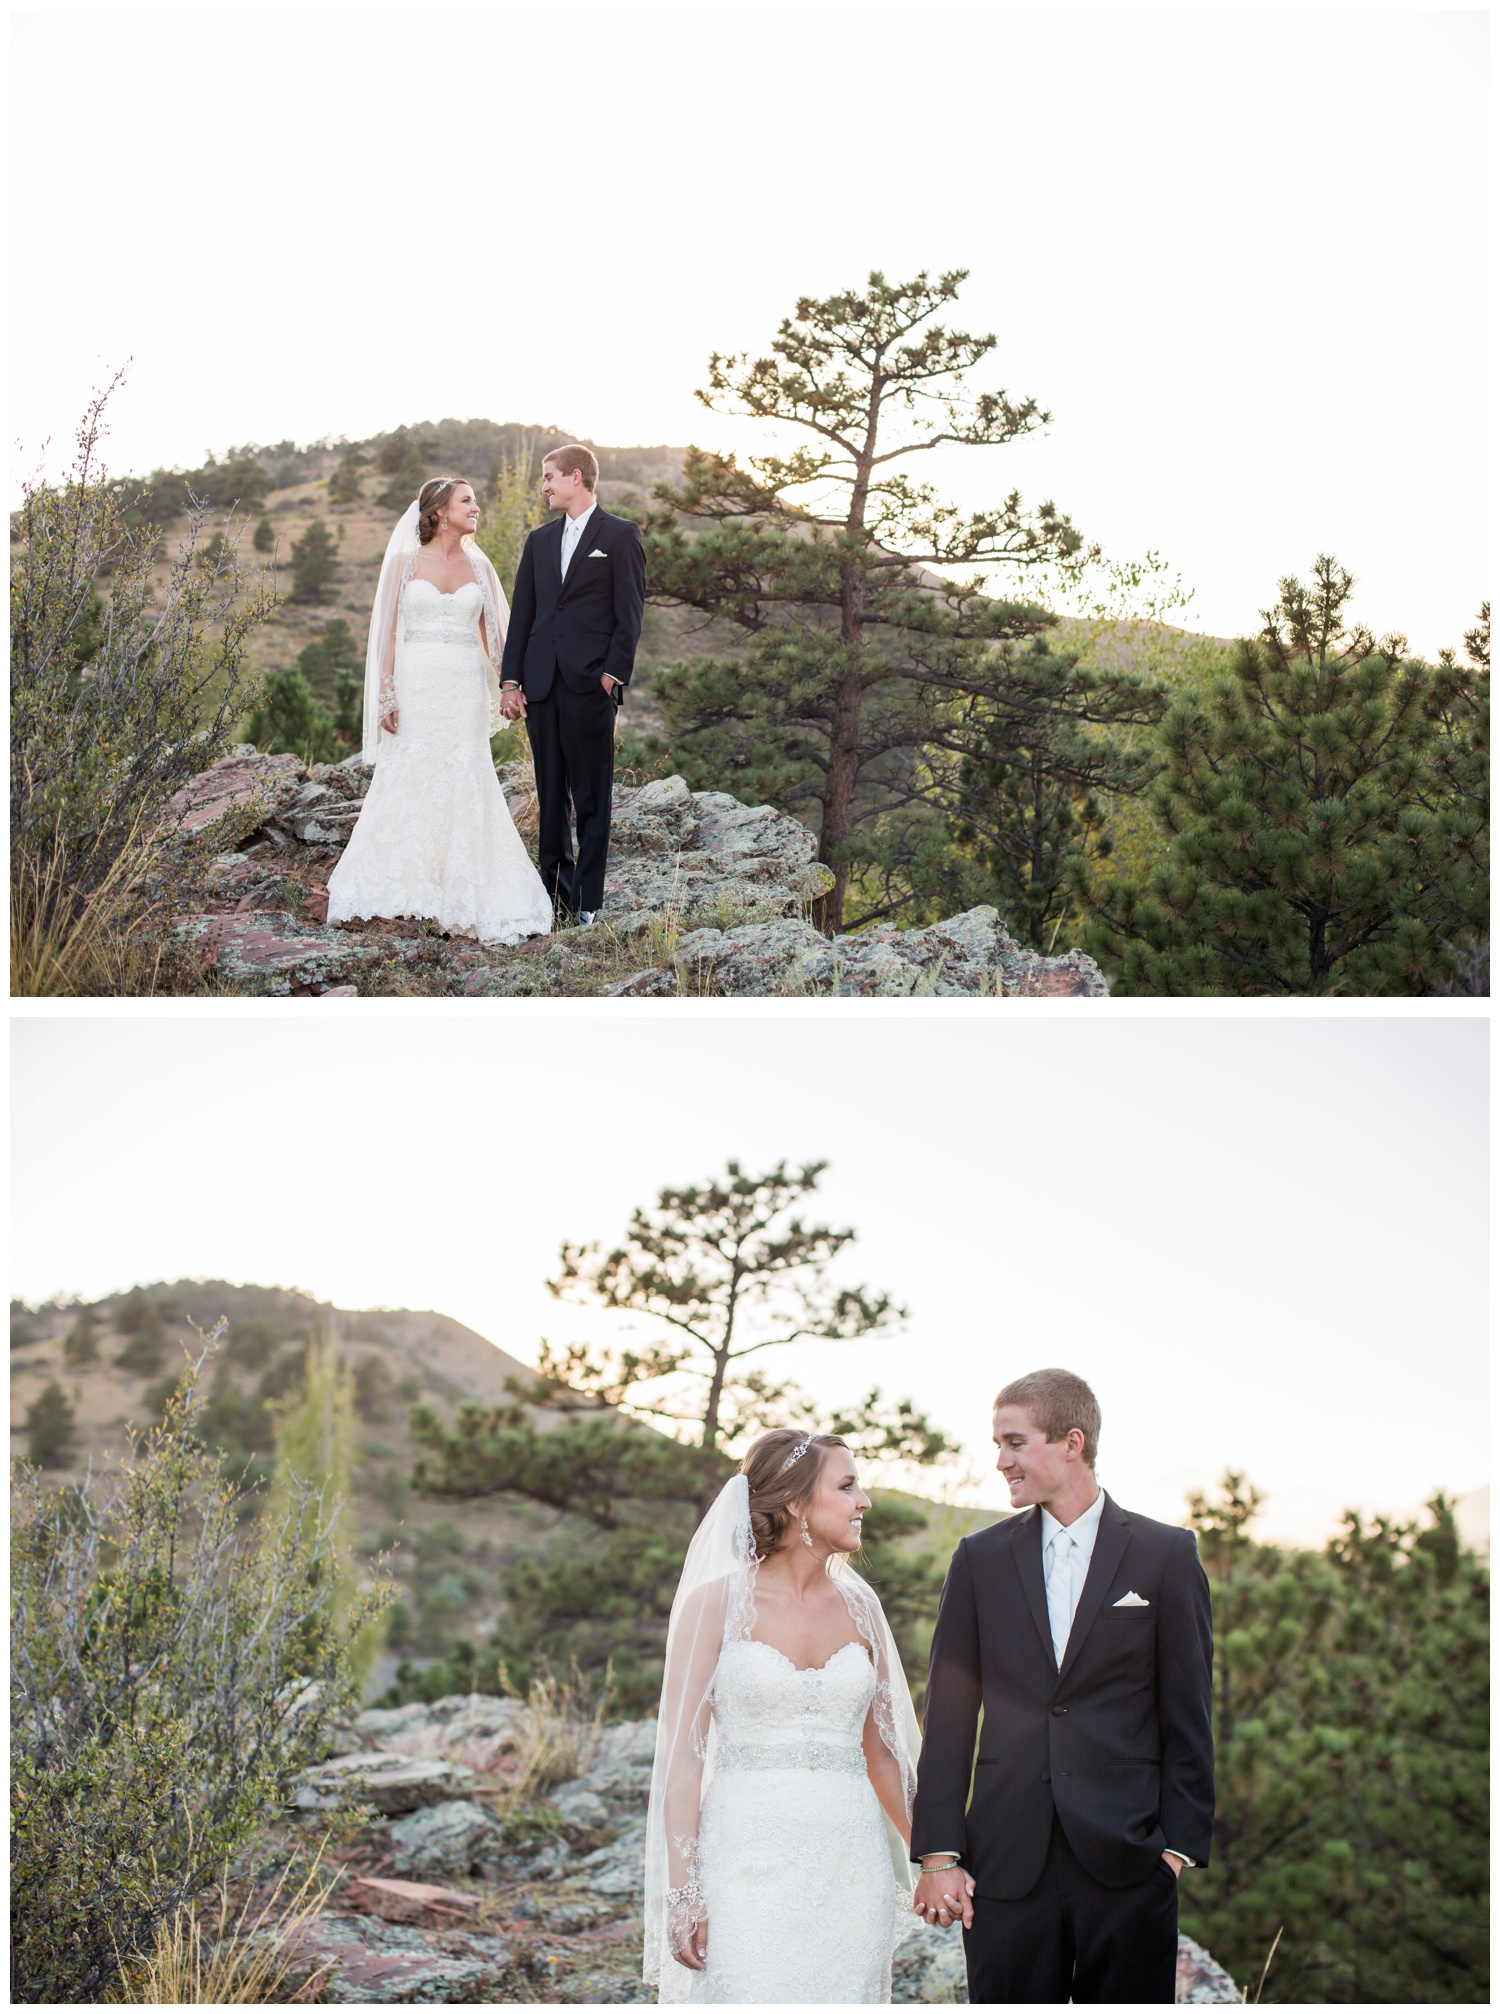 lionscrest manor wedding photography32.jpg